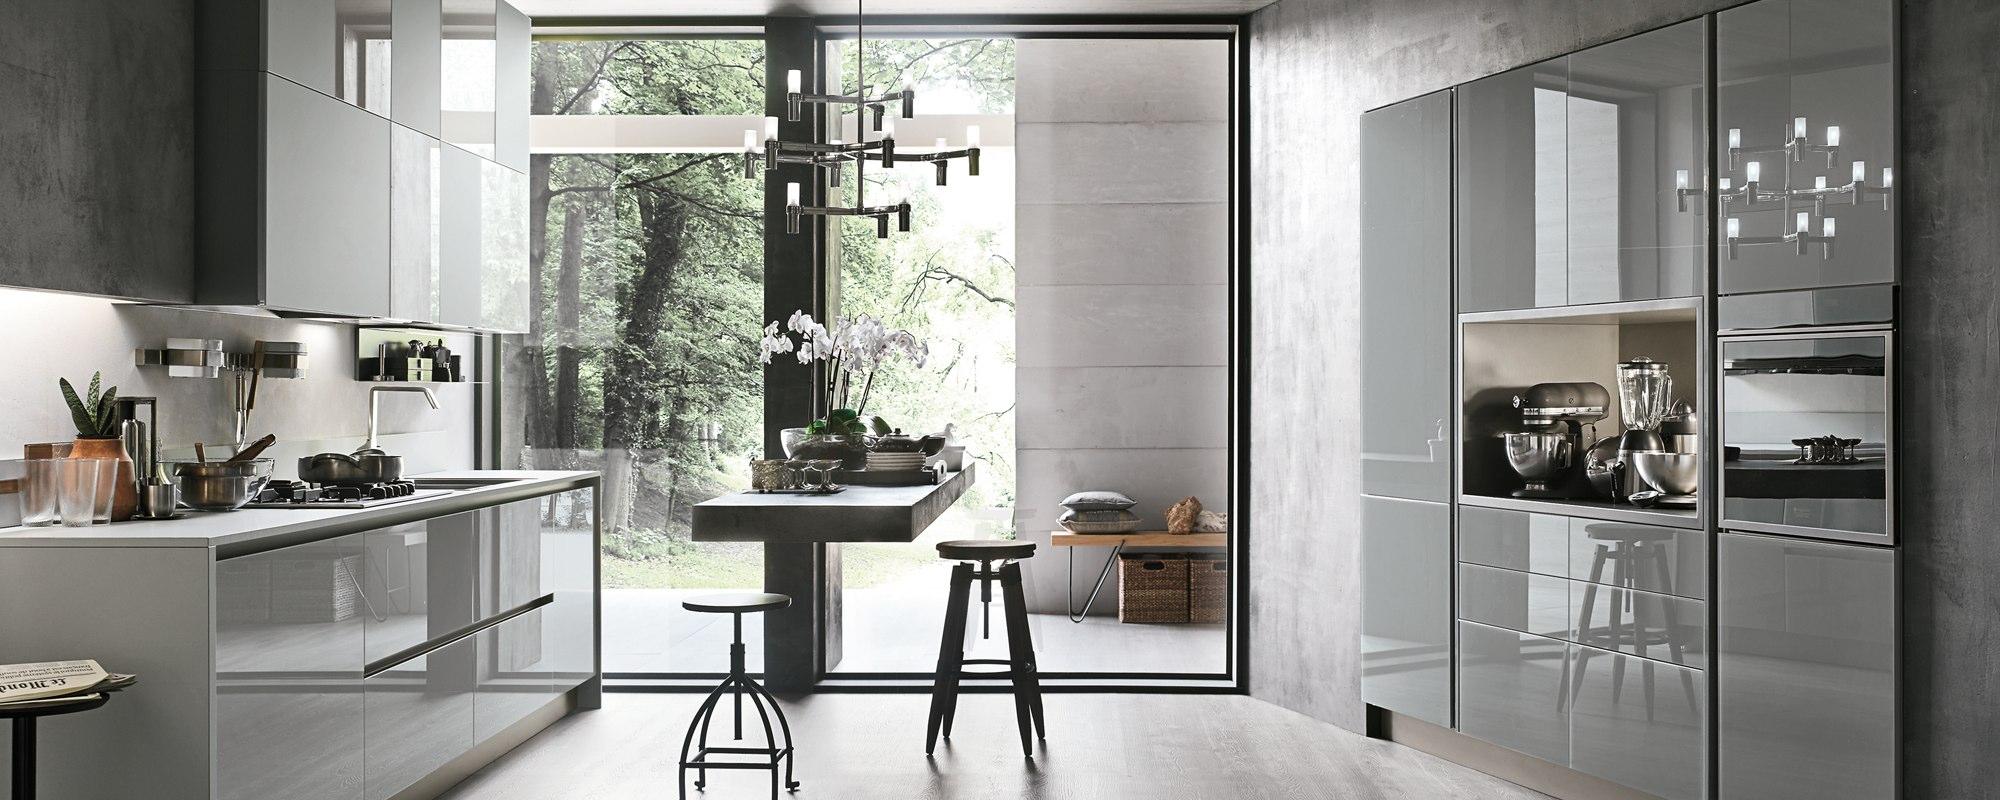 Stosa aliant mobili gala - Cucine stosa moderne ...